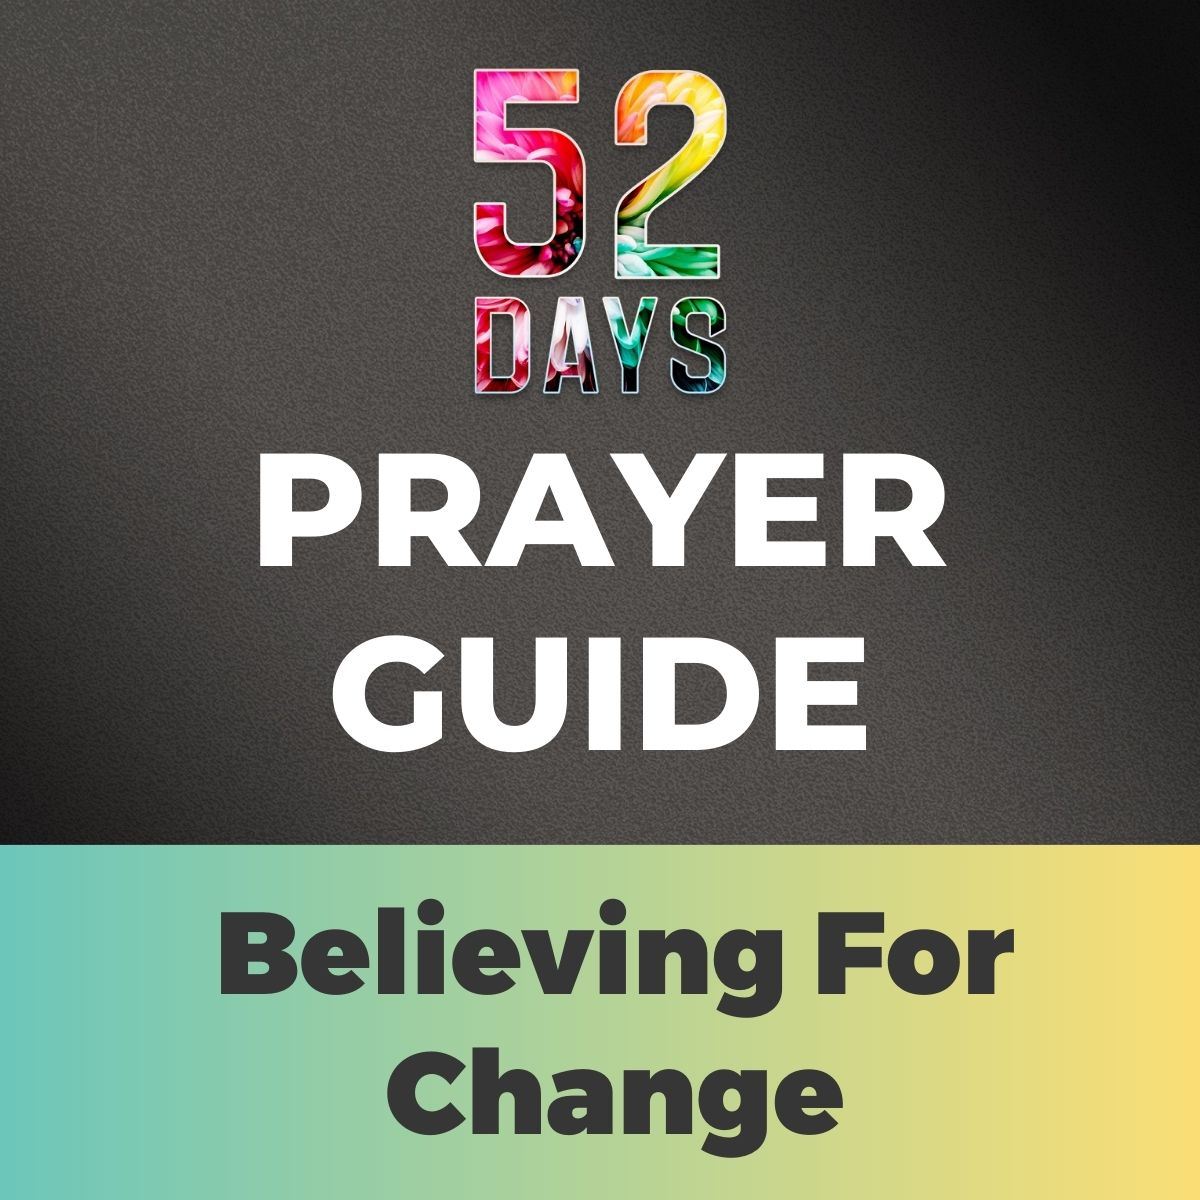 52_PrayerGuide_TILES_2